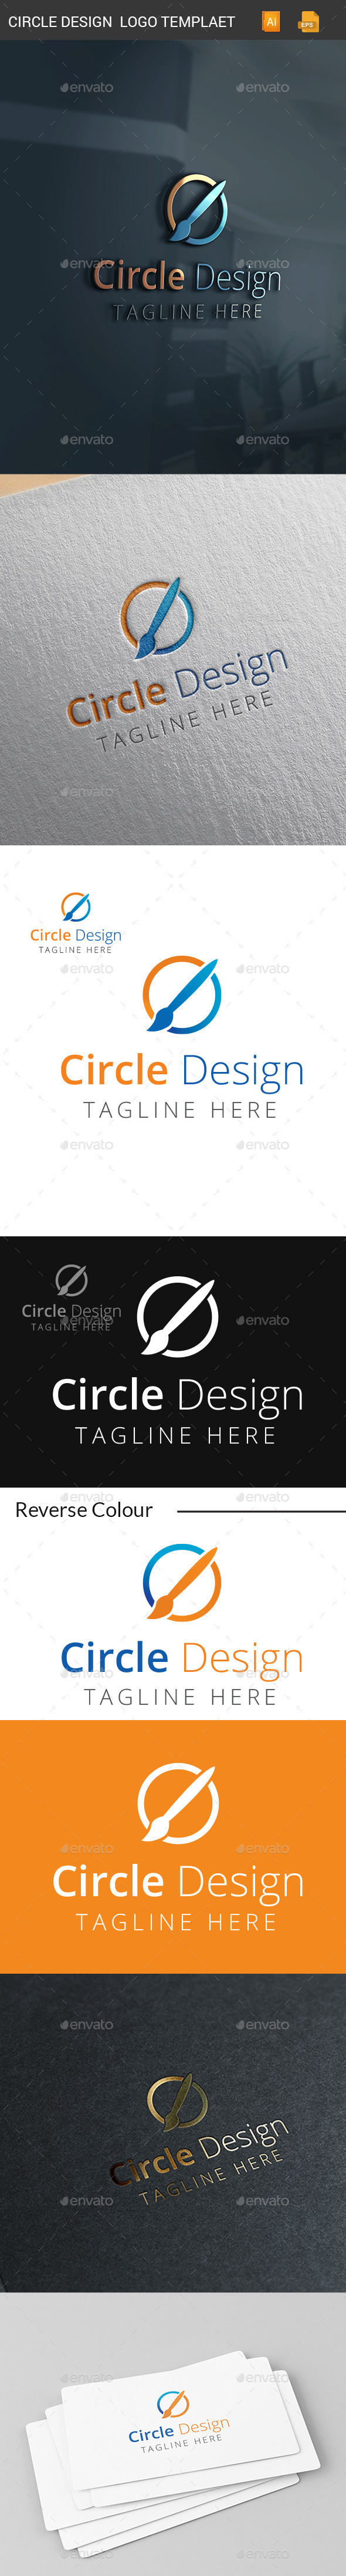 GraphicRiver Circle Design Logo Templates 11361745